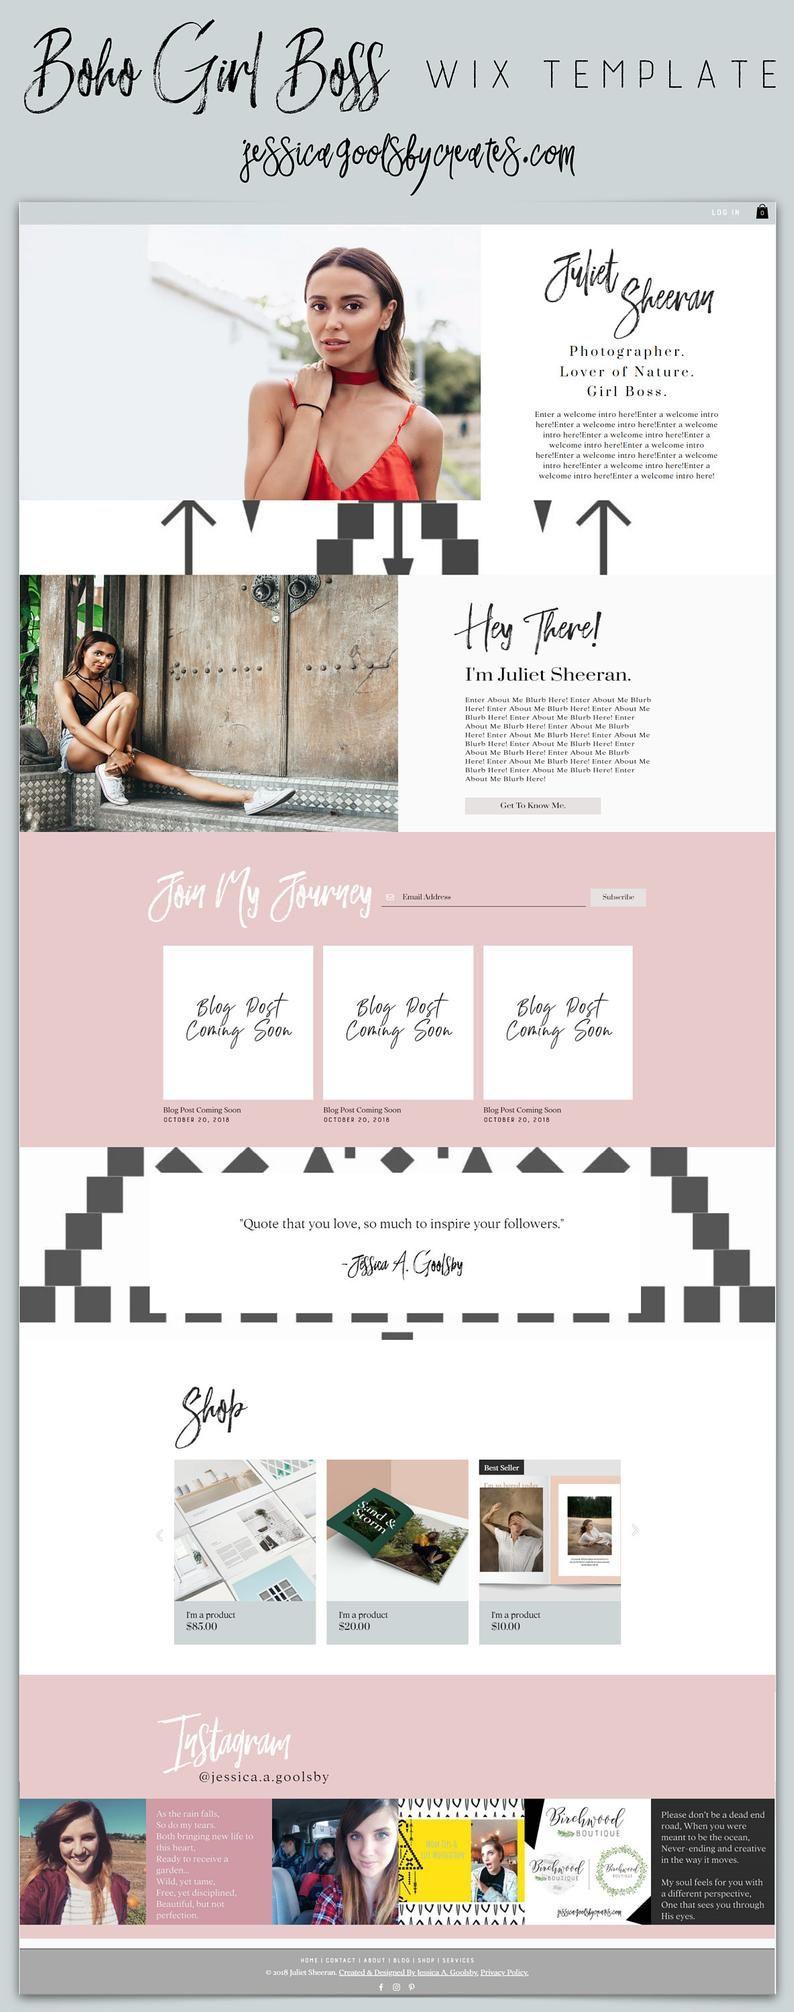 Boho Girl Boss Blog Store Services Wix Website Template